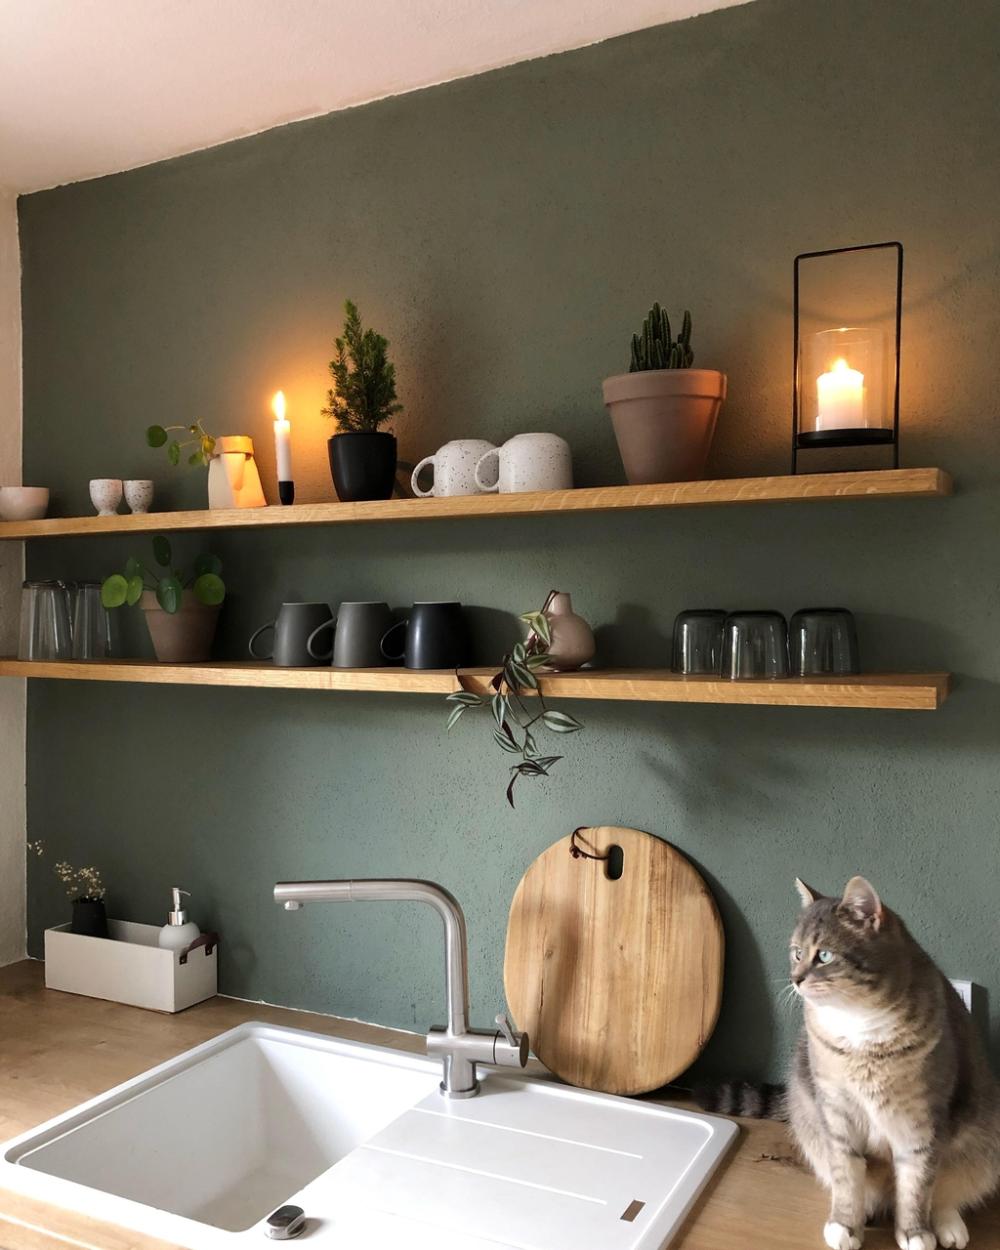 küche regal wandfarbe grün katze holzregal minitannenbaum ...